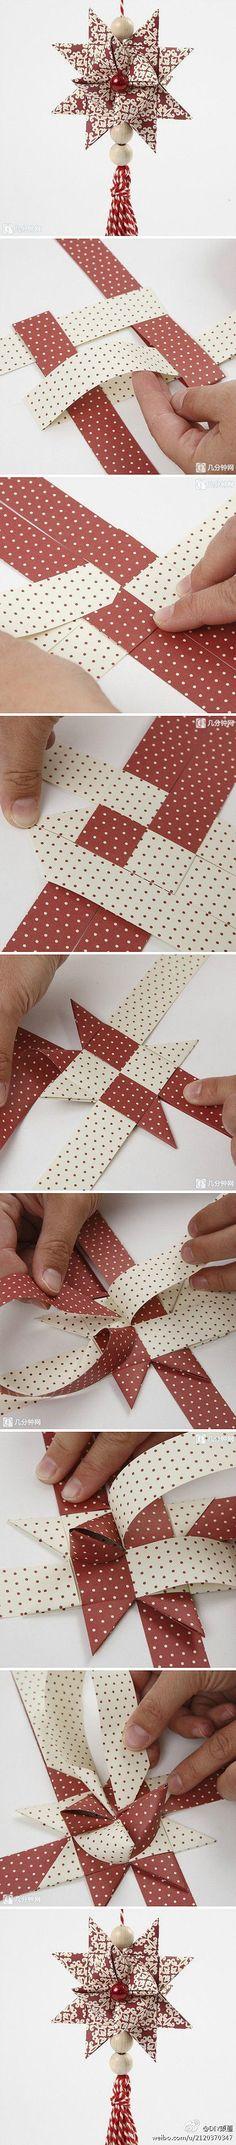 Paper folding decoration